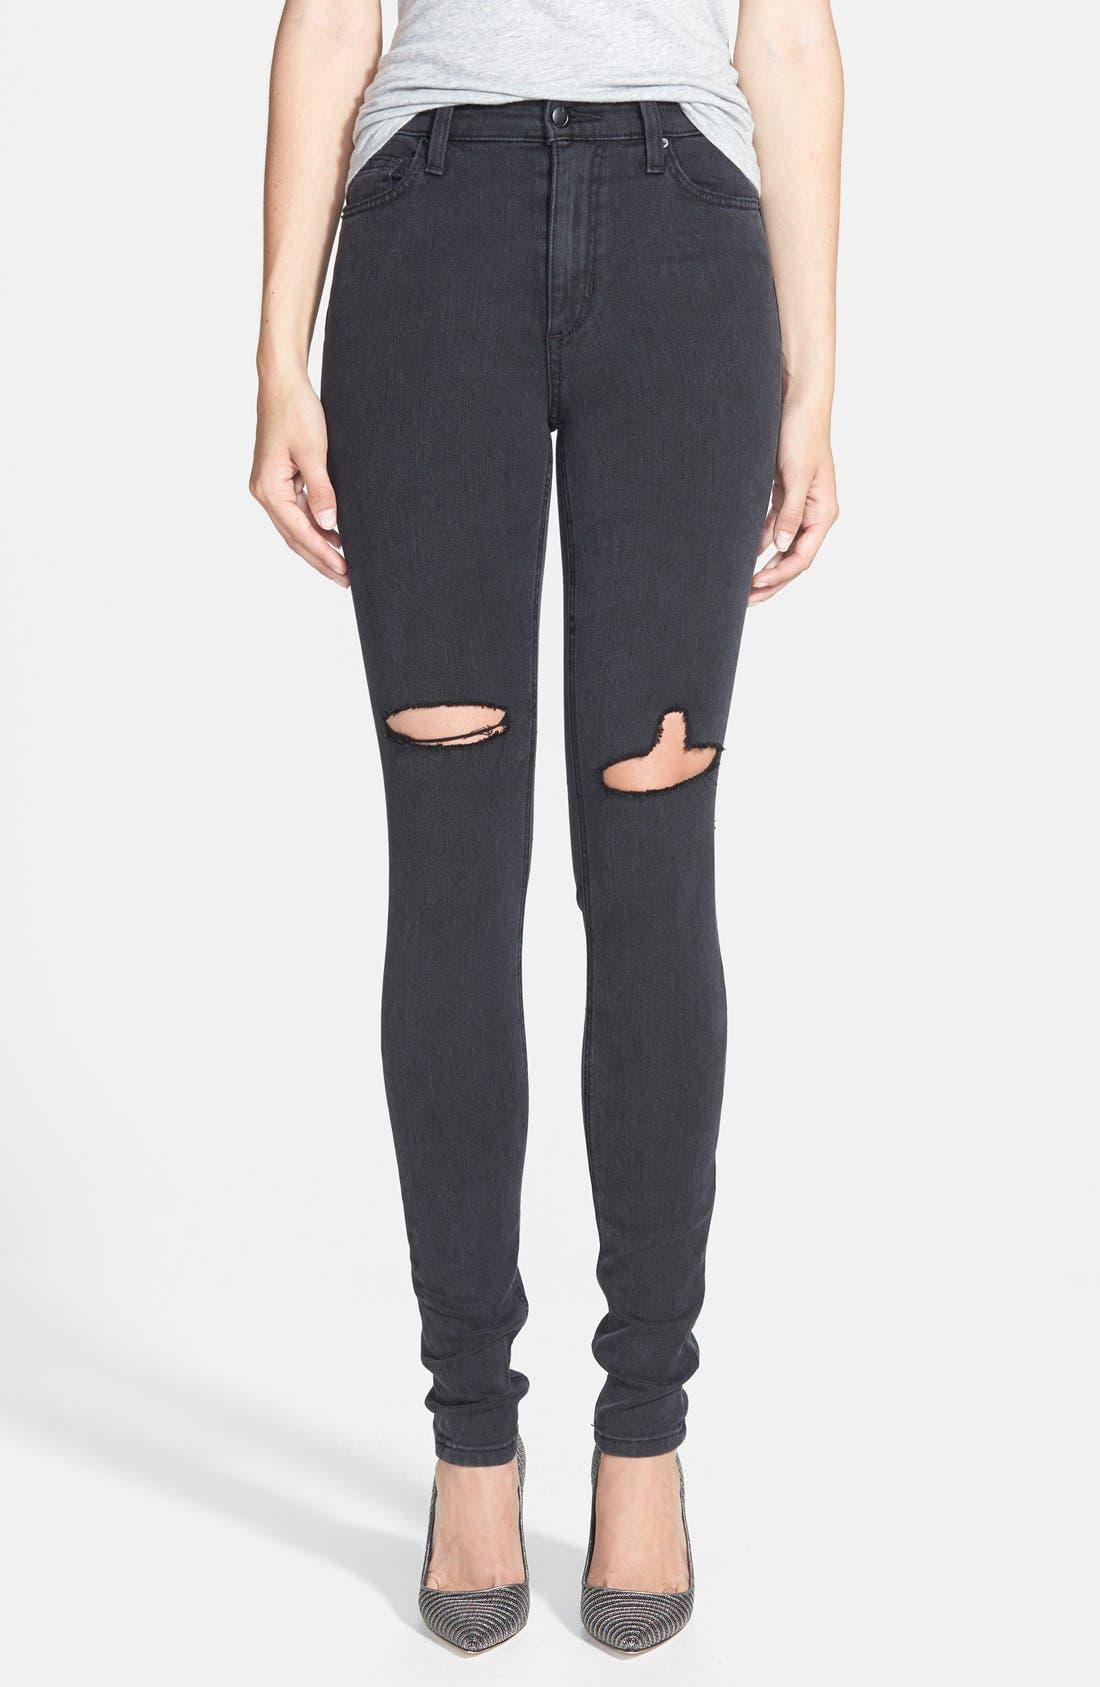 Alternate Image 1 Selected - Joe's High Rise Skinny Jeans (Rhea)